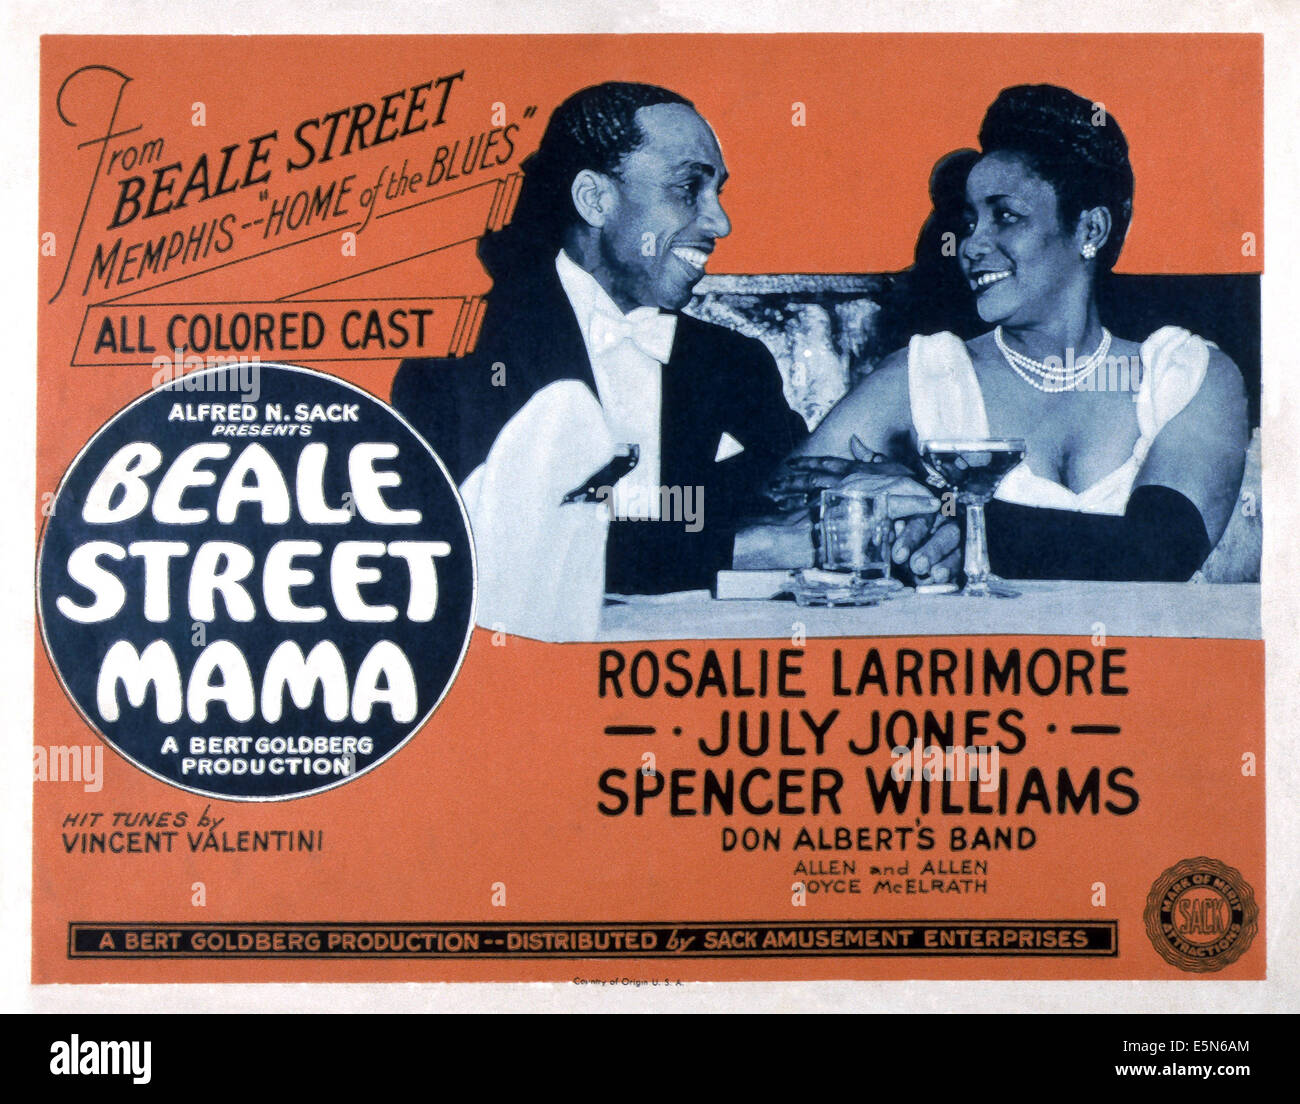 BEALE STREET MAMA, 1947 Stockbild